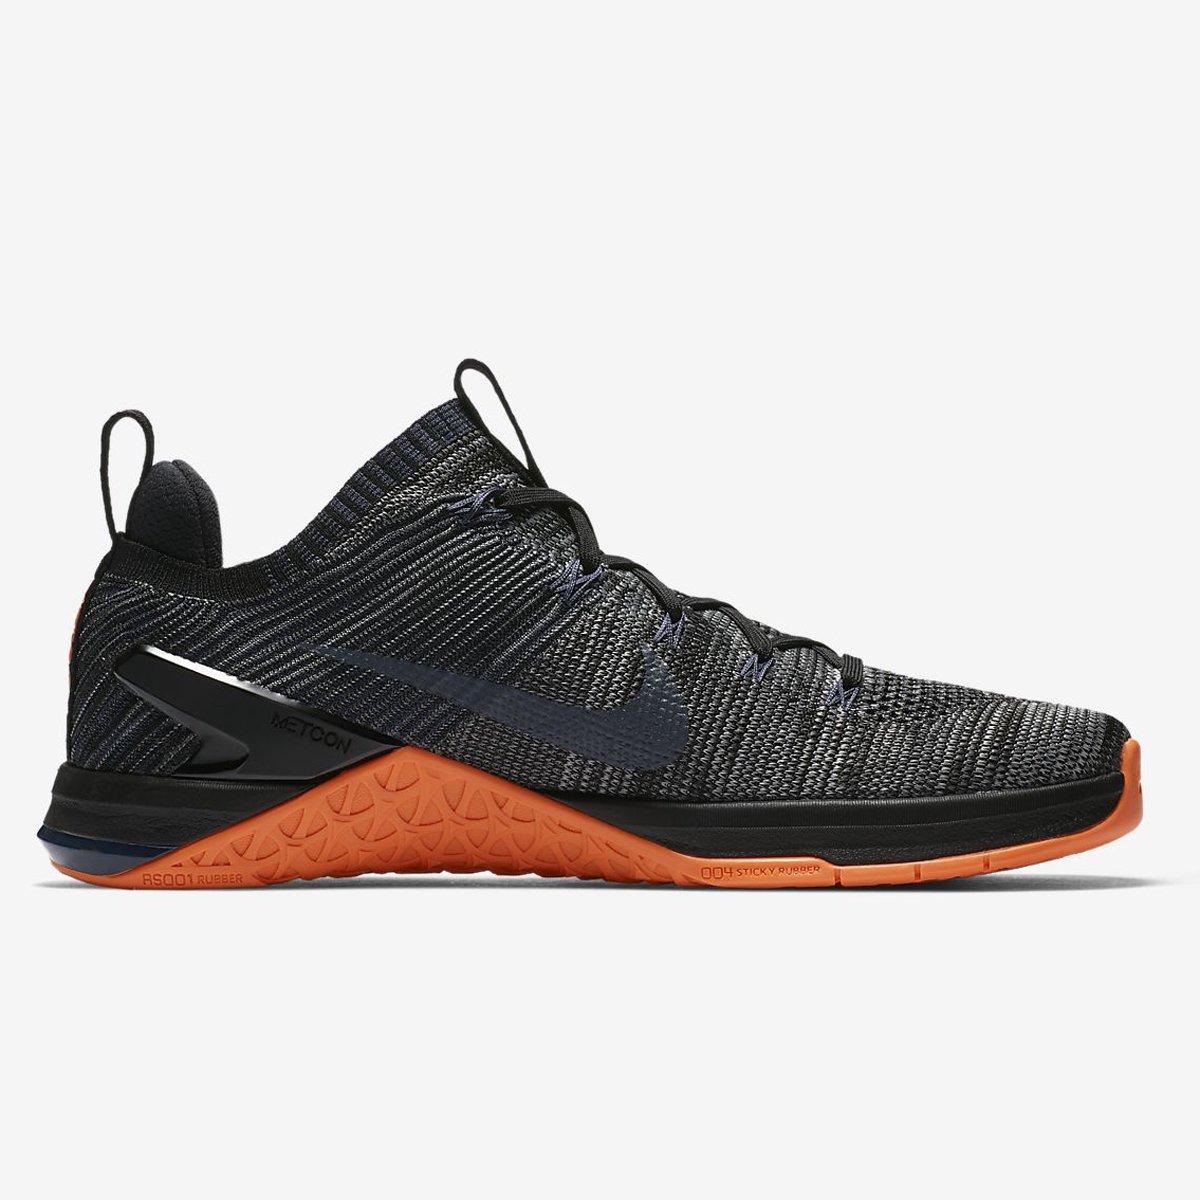 22f4fe4f0ad20 Men s Shoes Nike Metcon DSX Flyknit 2 Mens Training Shoe Black Hyper  Crimson 924423 005